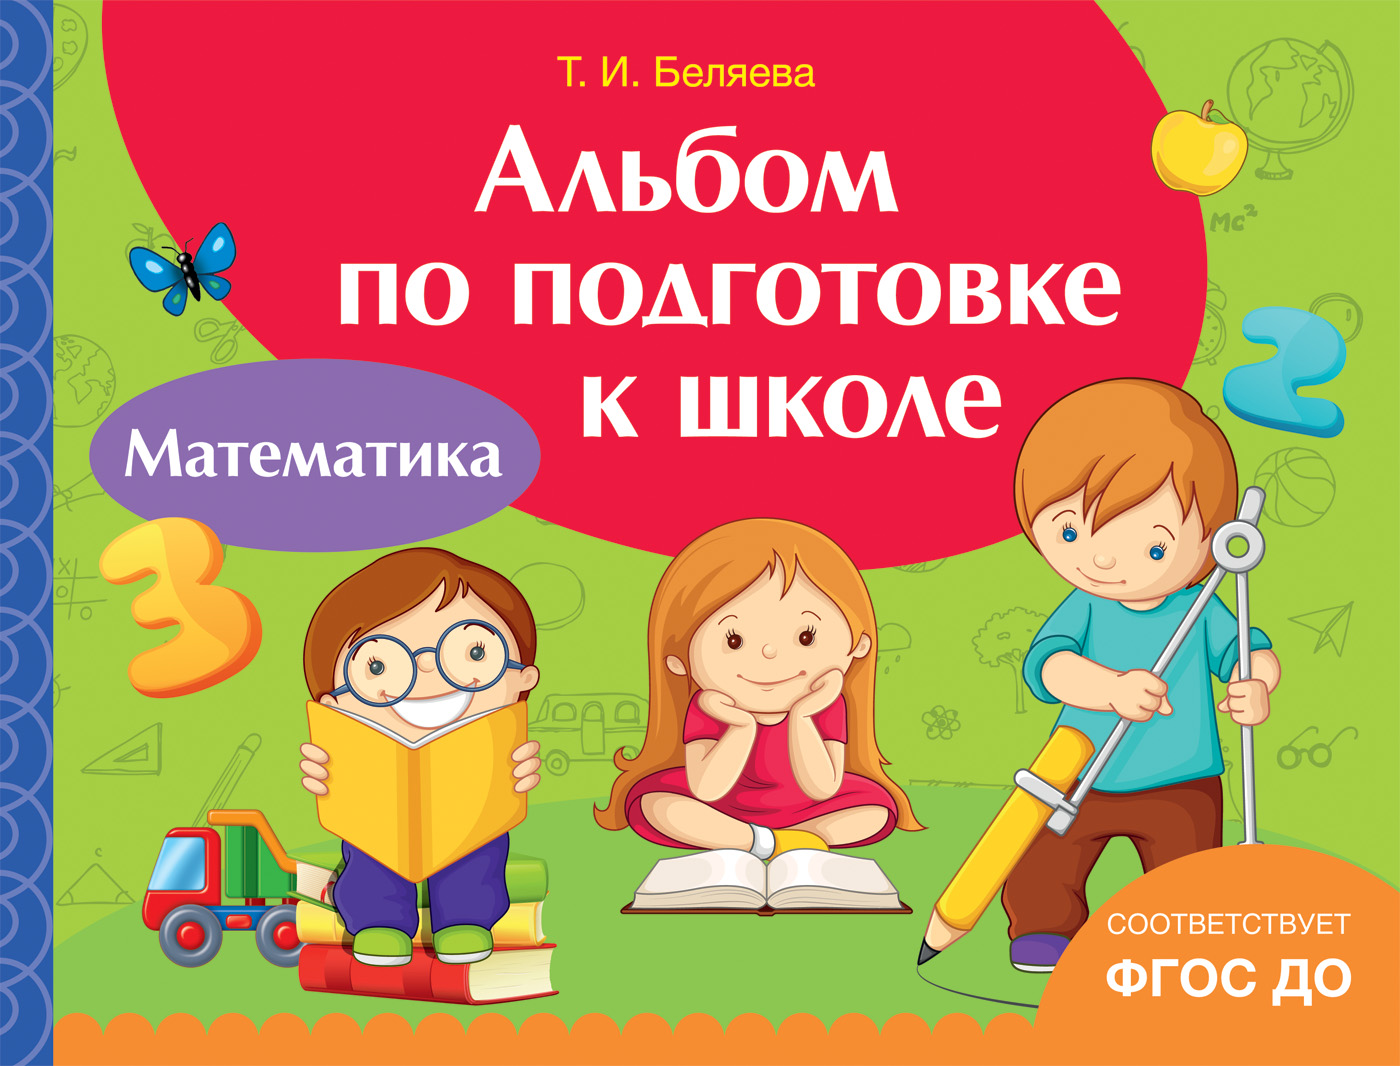 картинка Альбом по подготовке к школе - Математика от магазина Bebikam.ru